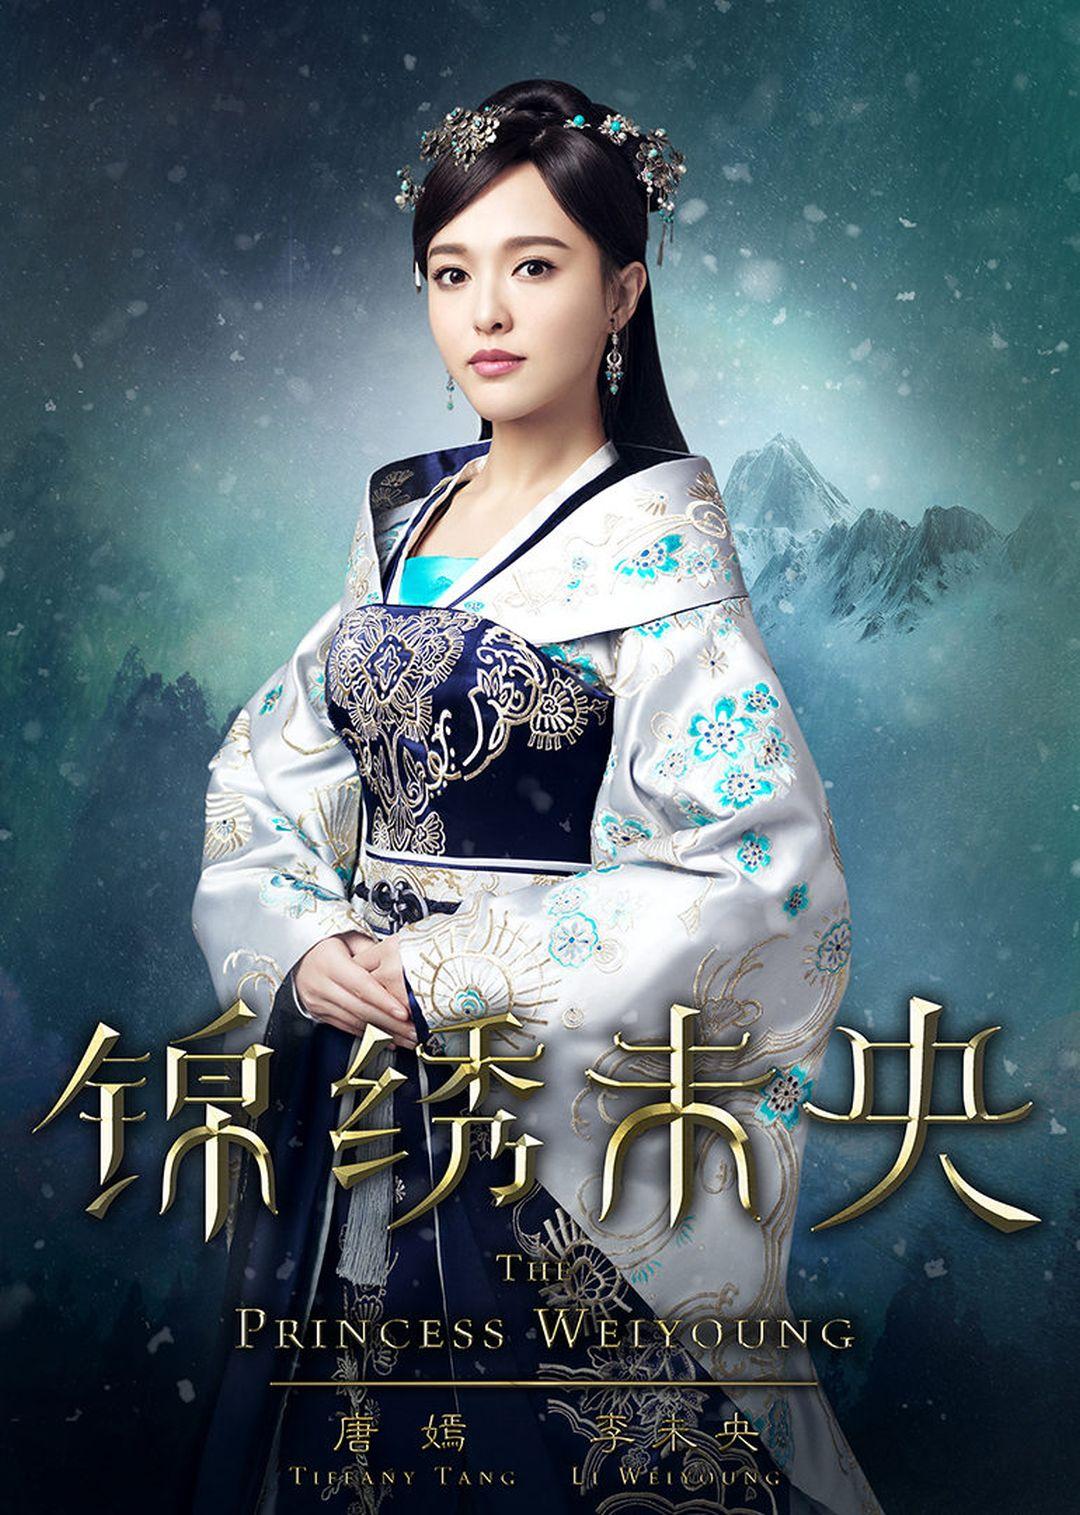 Dorama Princessa Vej Yan - Принцесса Вэй Ян ✸ 2016 ✸